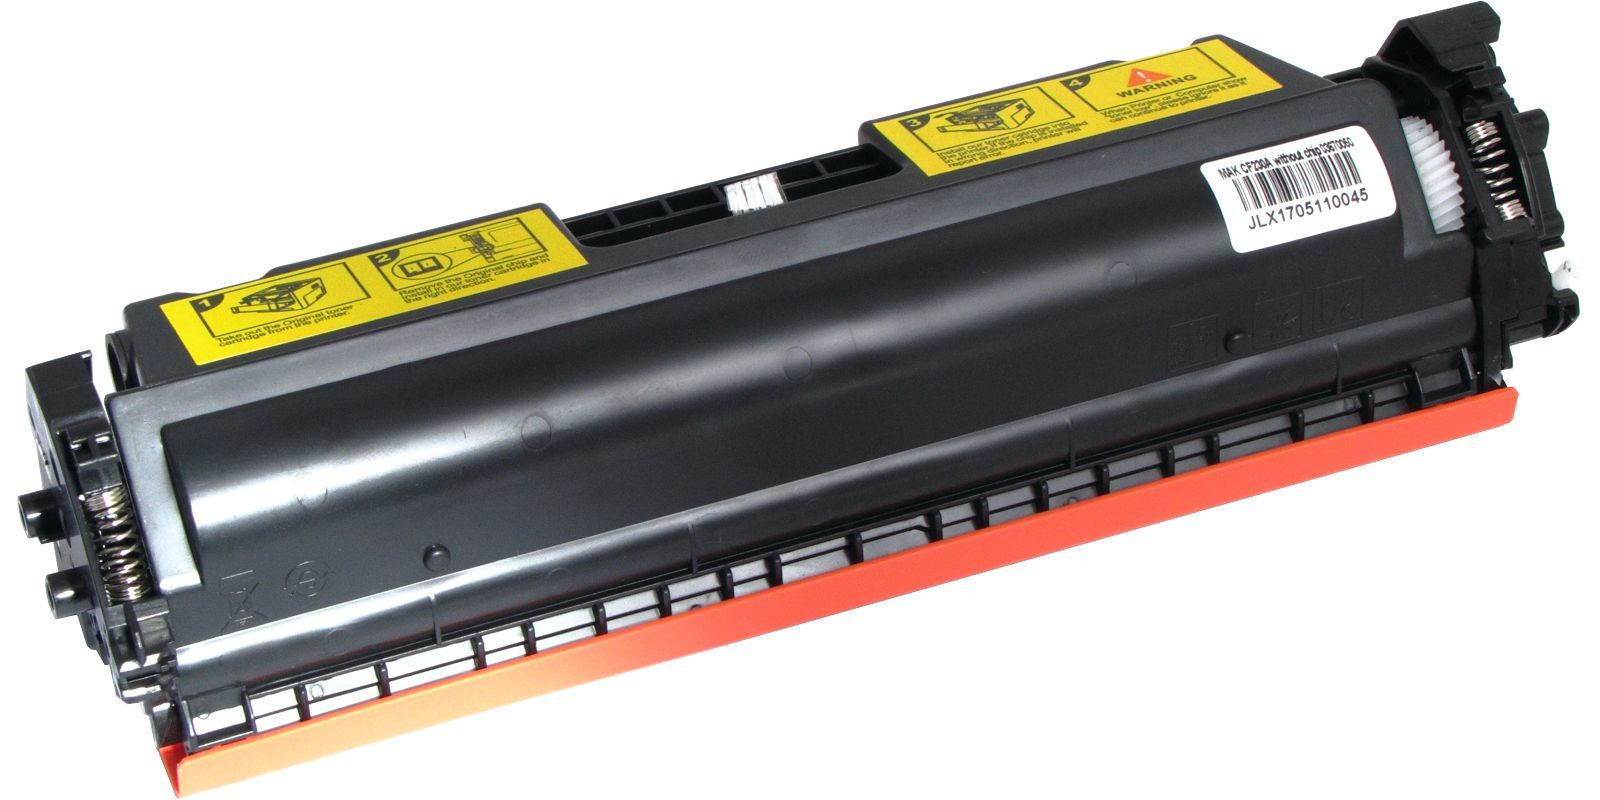 ЦРМ ML-1710D3, черный, для Samsung, до 3000 стр.б